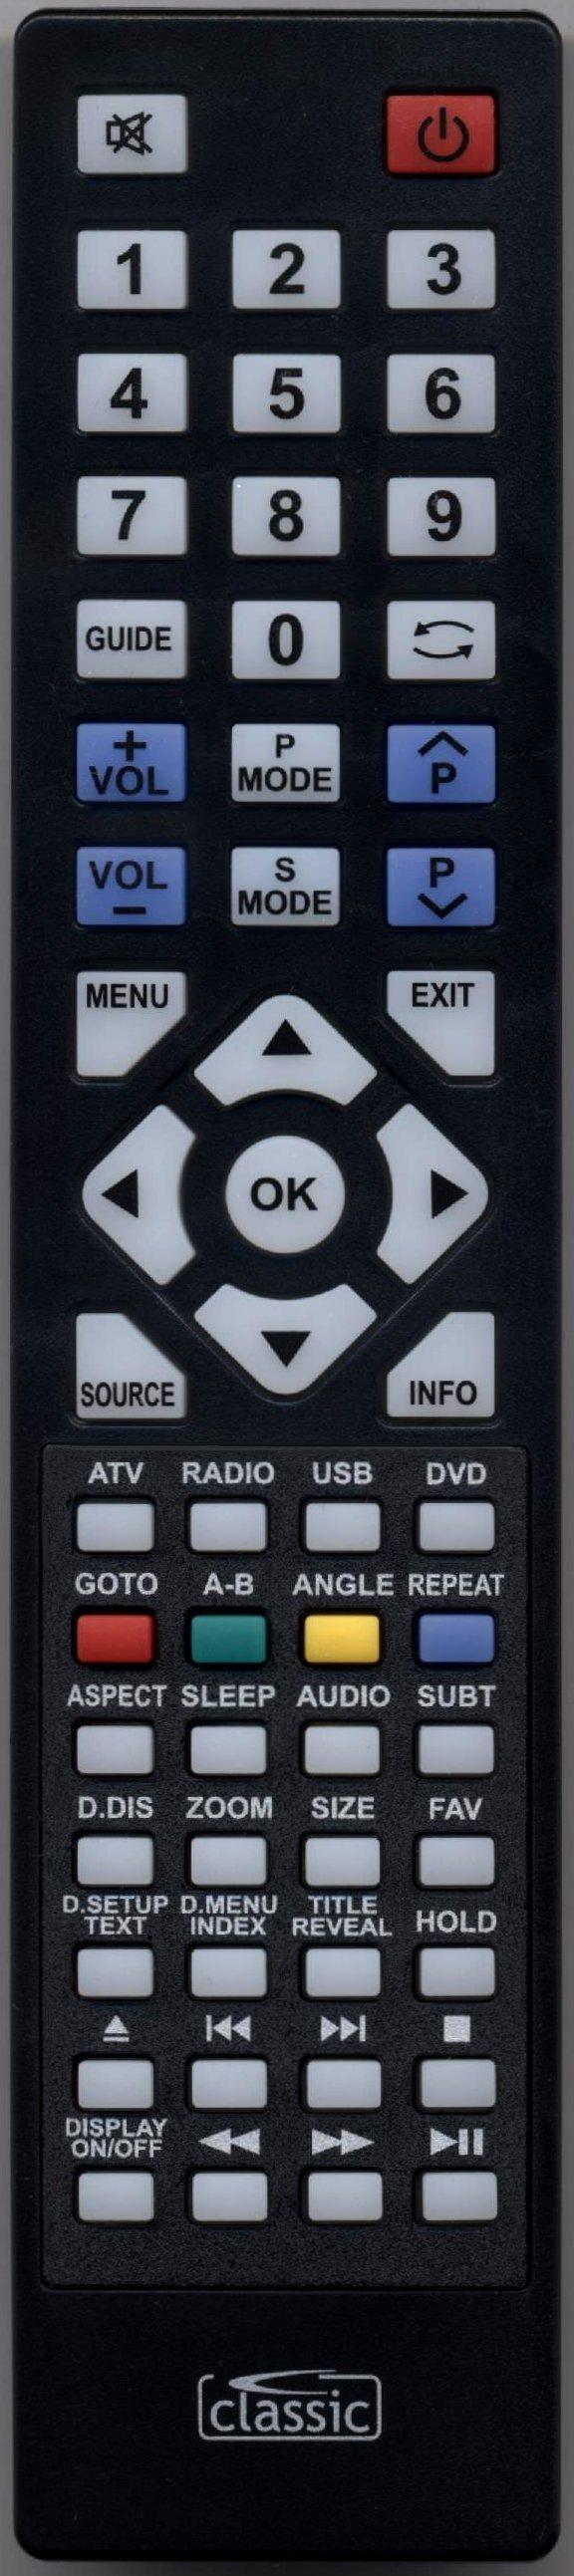 TECHNIKA 19-228W Remote Control Alternative